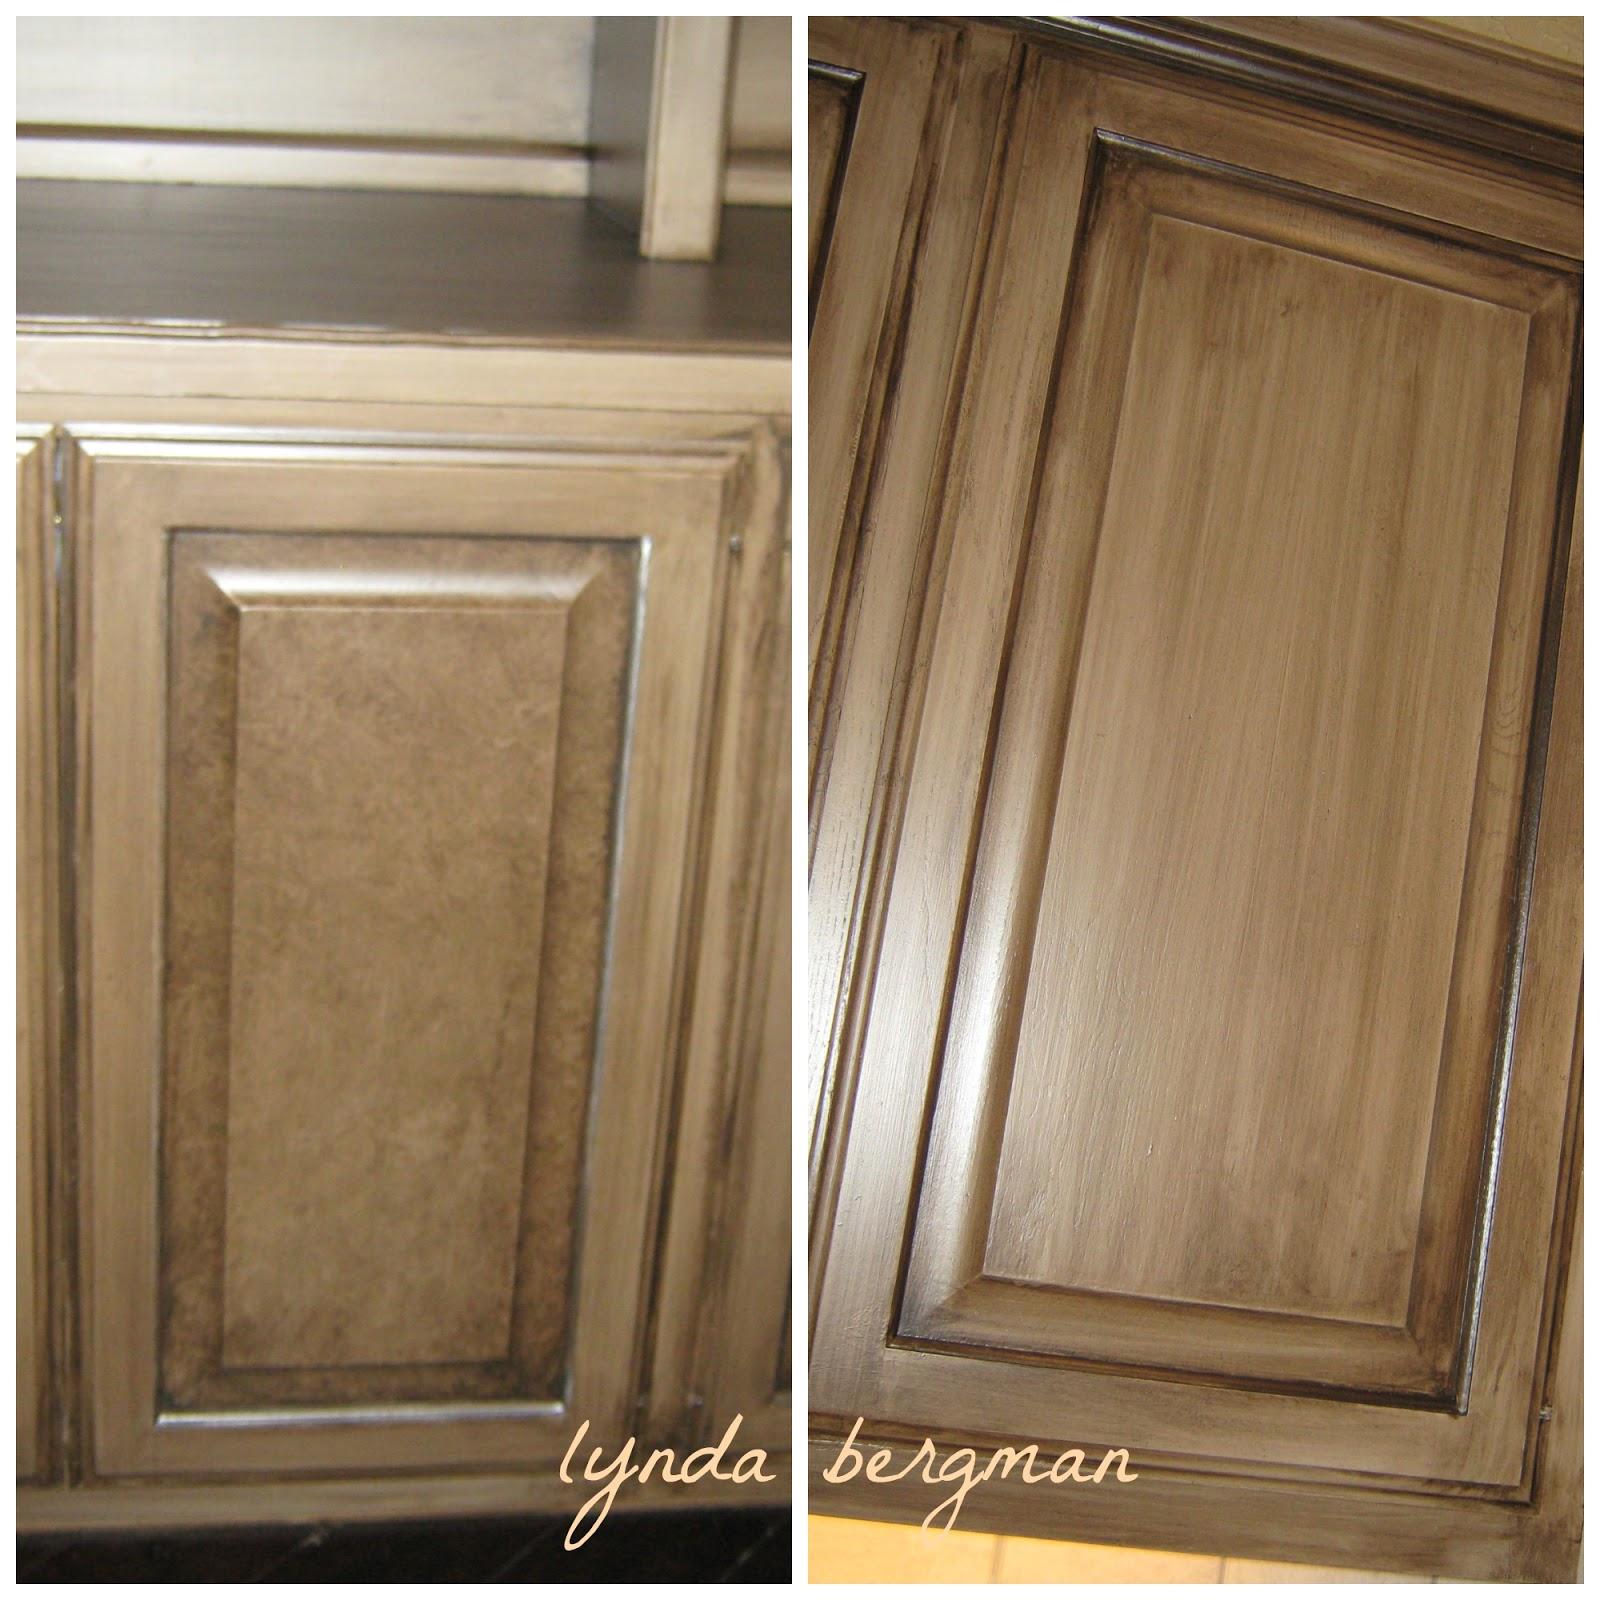 Faux Paint Kitchen Cabinets: LYNDA BERGMAN DECORATIVE ARTISAN: PAINTING STEPHANIE'S